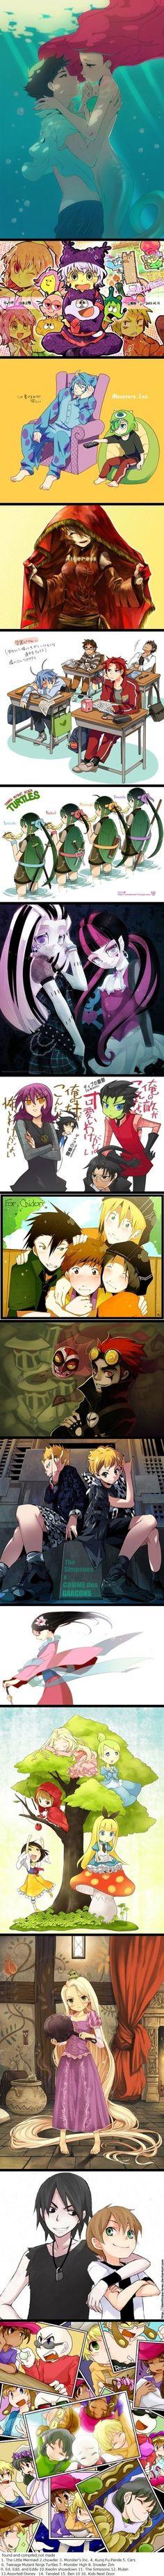 CartooN /DisNeY ---> Anime, makes everything look even better😄